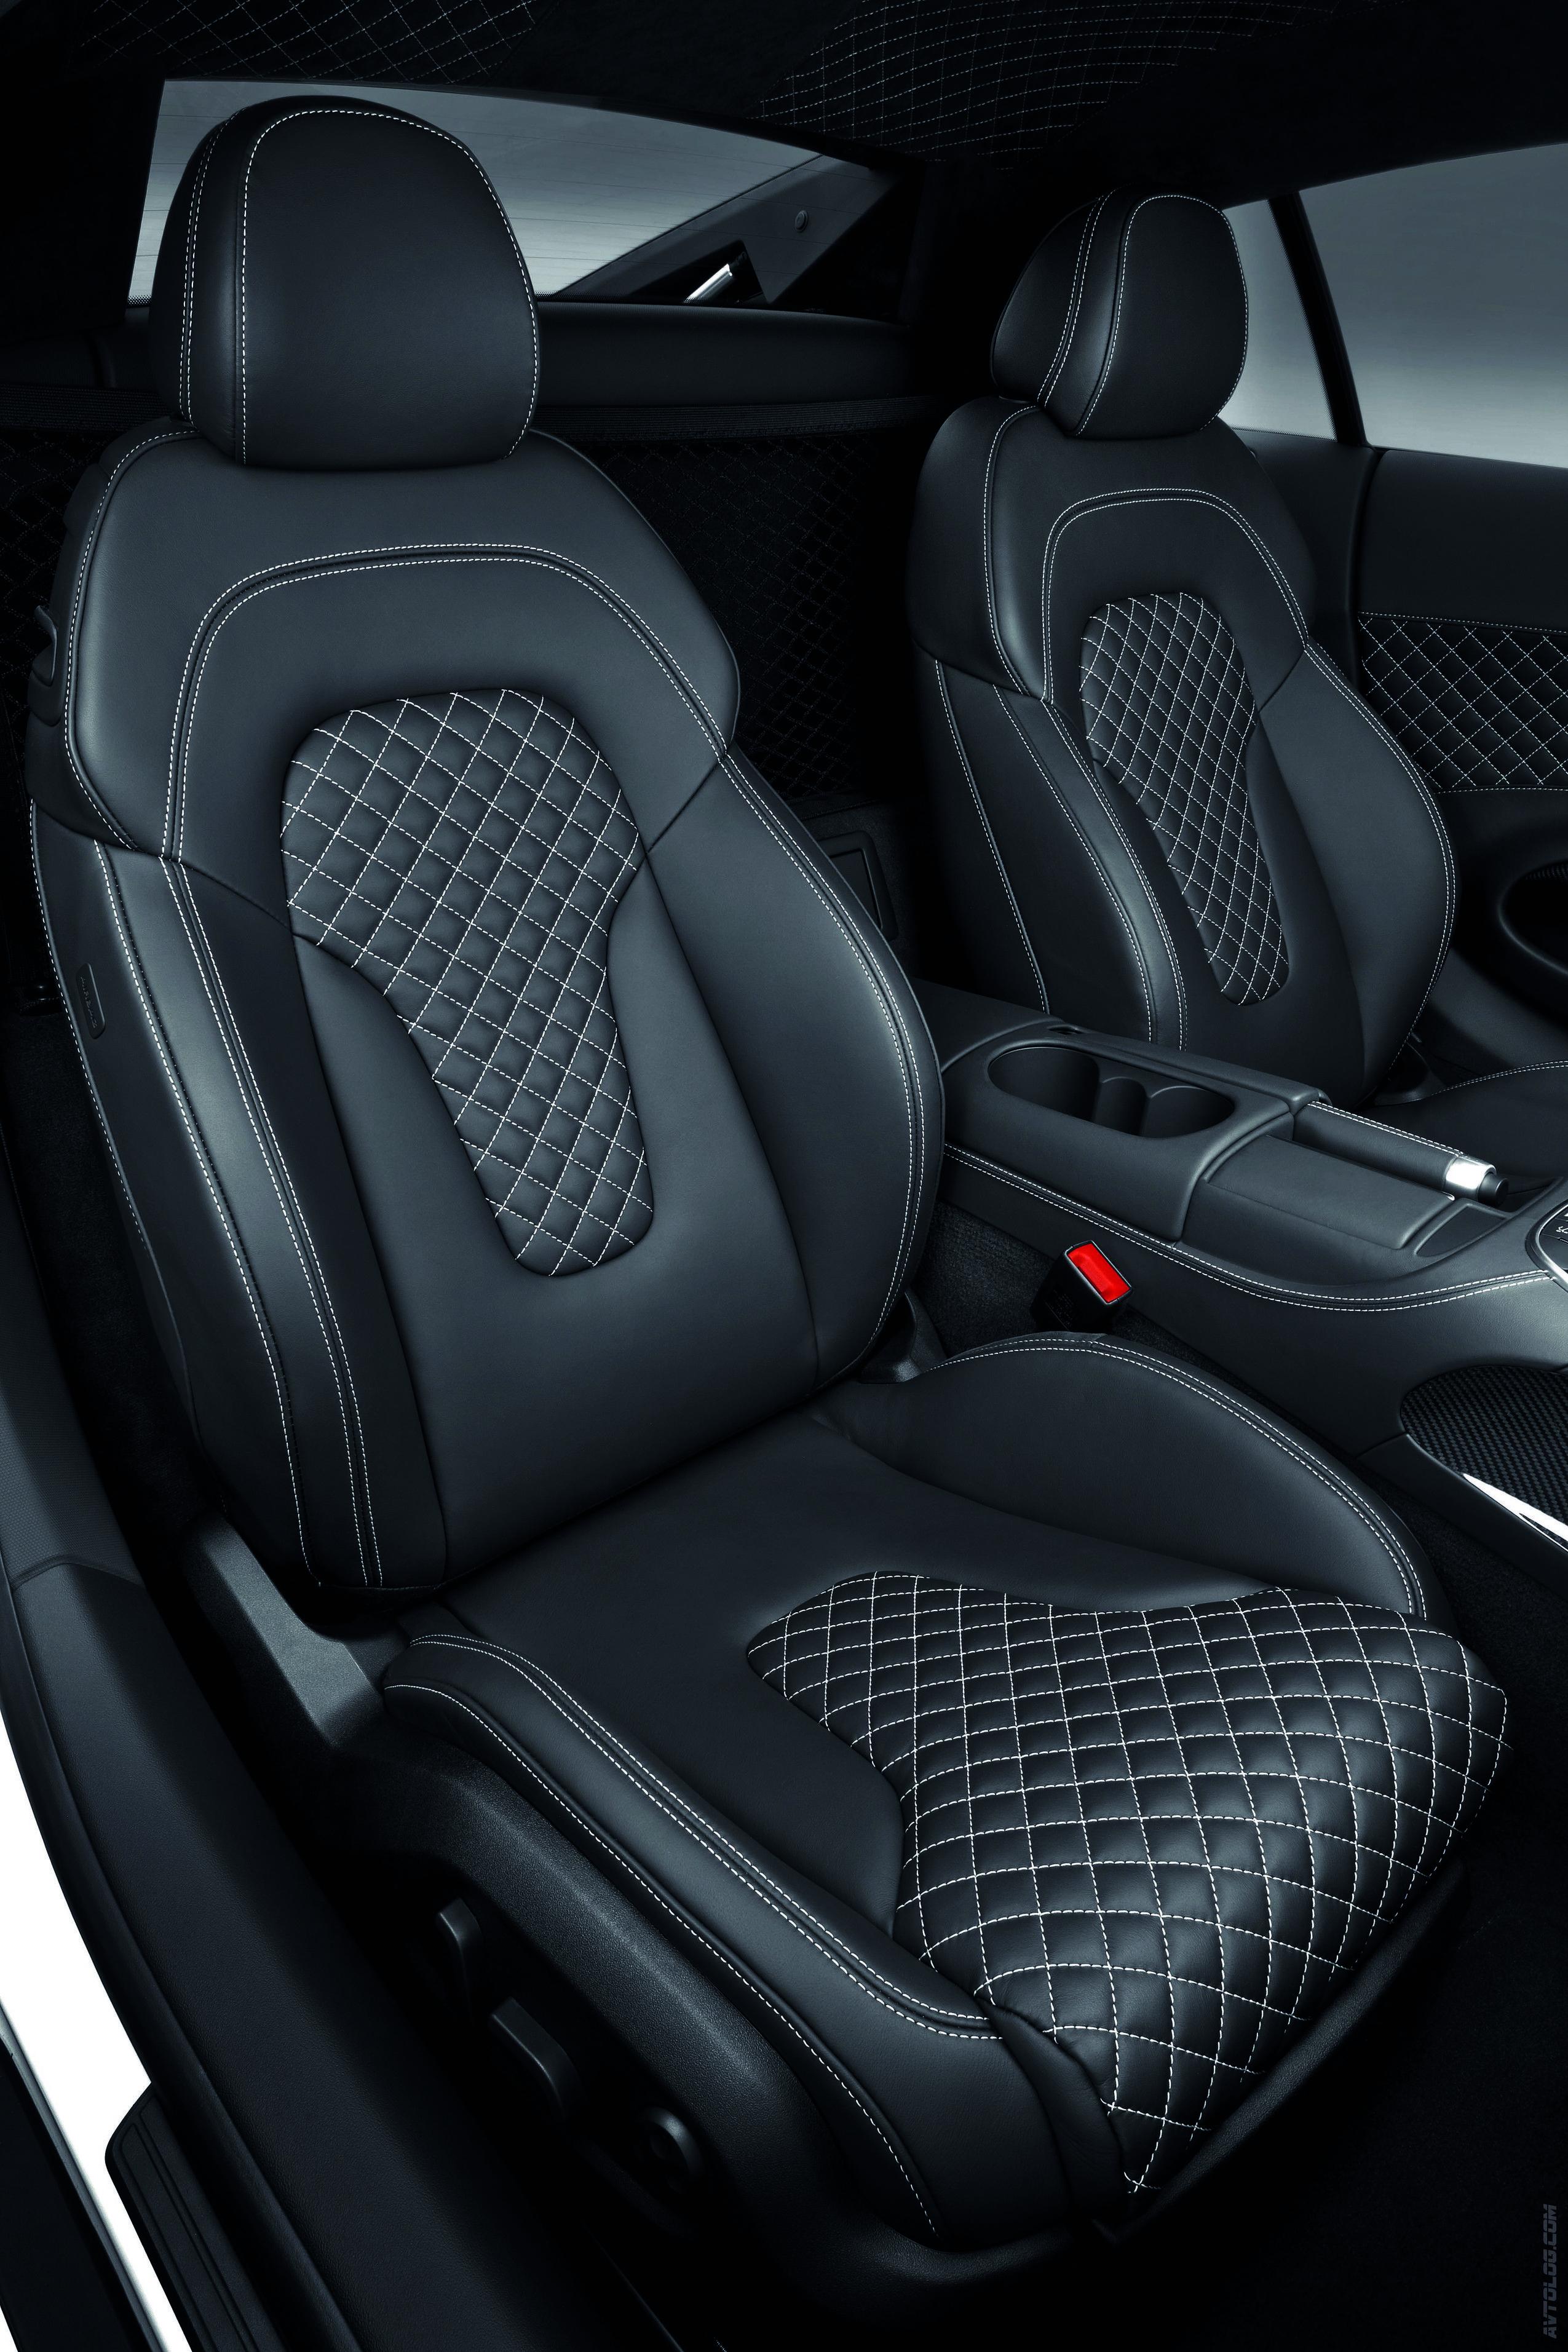 Pin by Rok Pregelj on Stitches   Custom car interior, Car ...